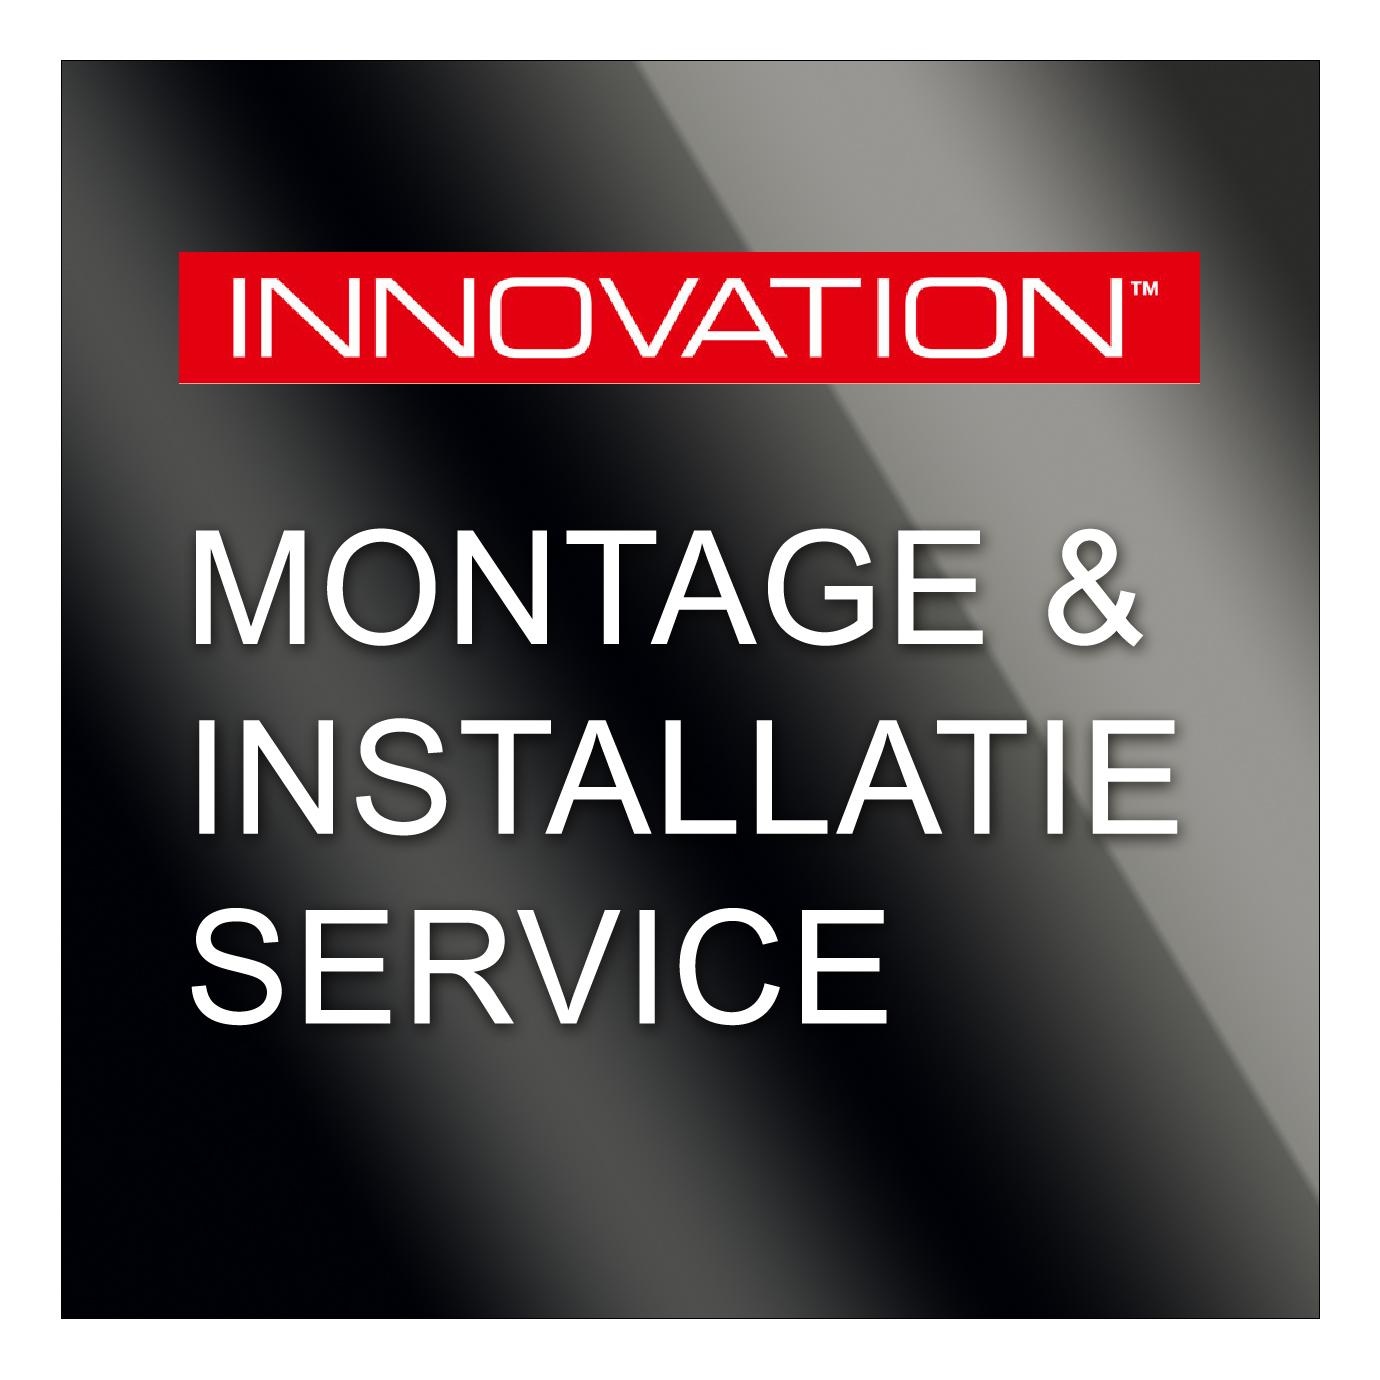 Innovation Montage&Installatieservice